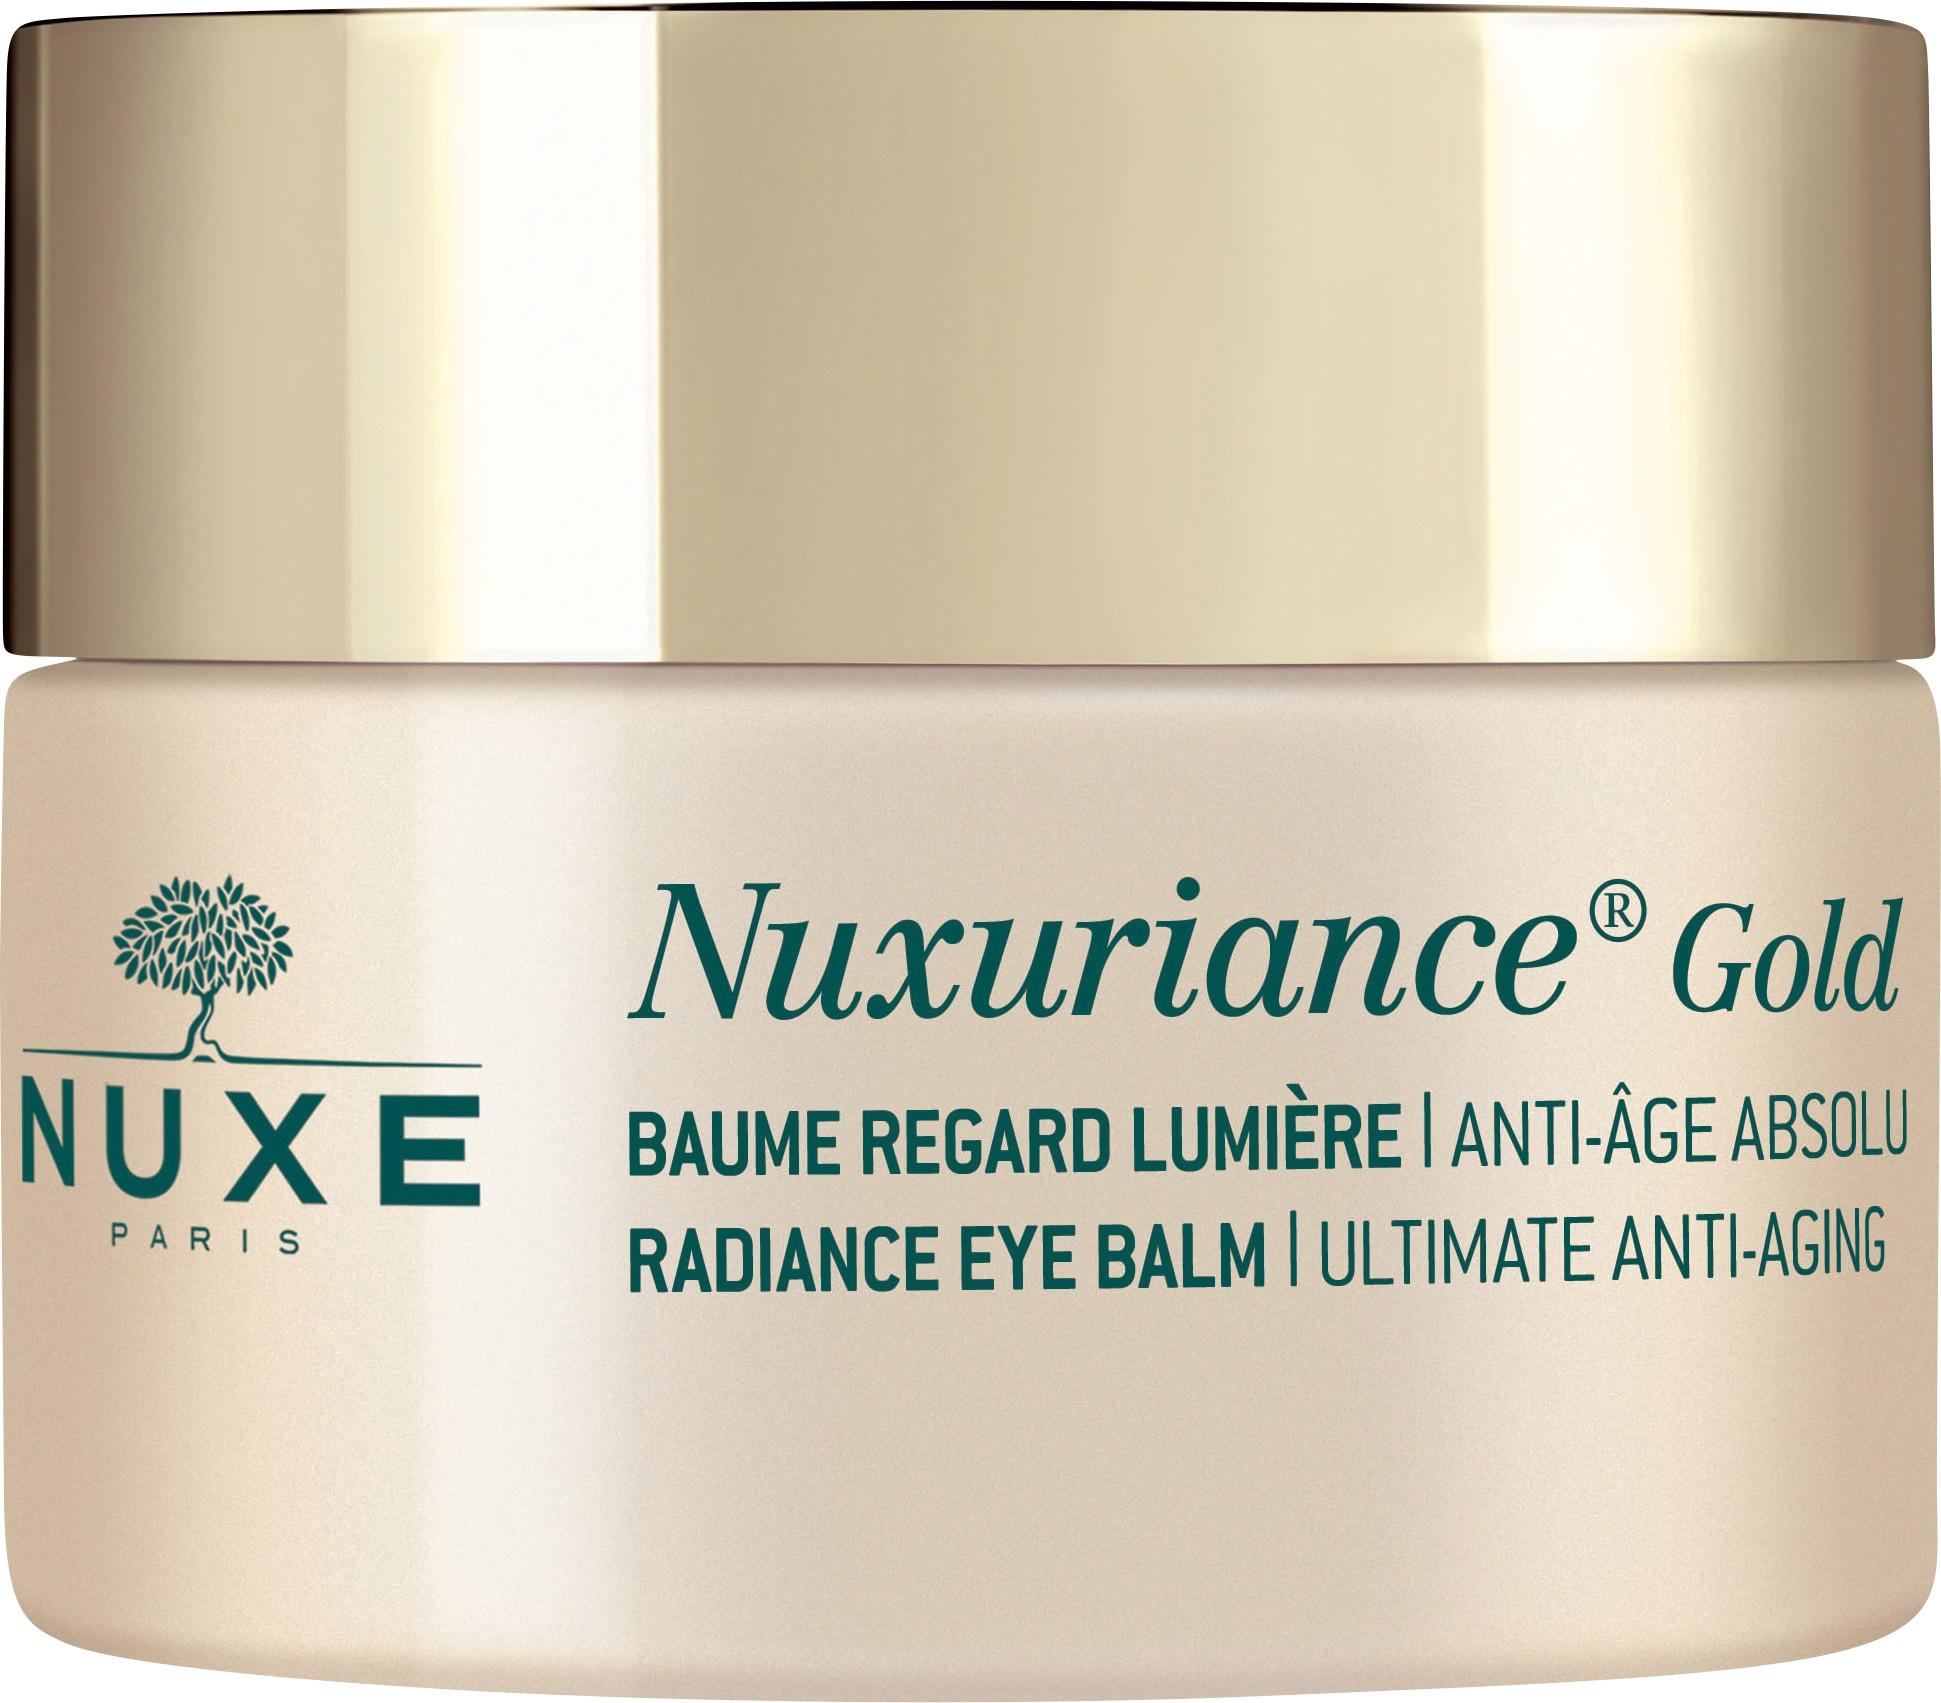 Nuxe Nuxuriance® Gold Radiance Eye Balm